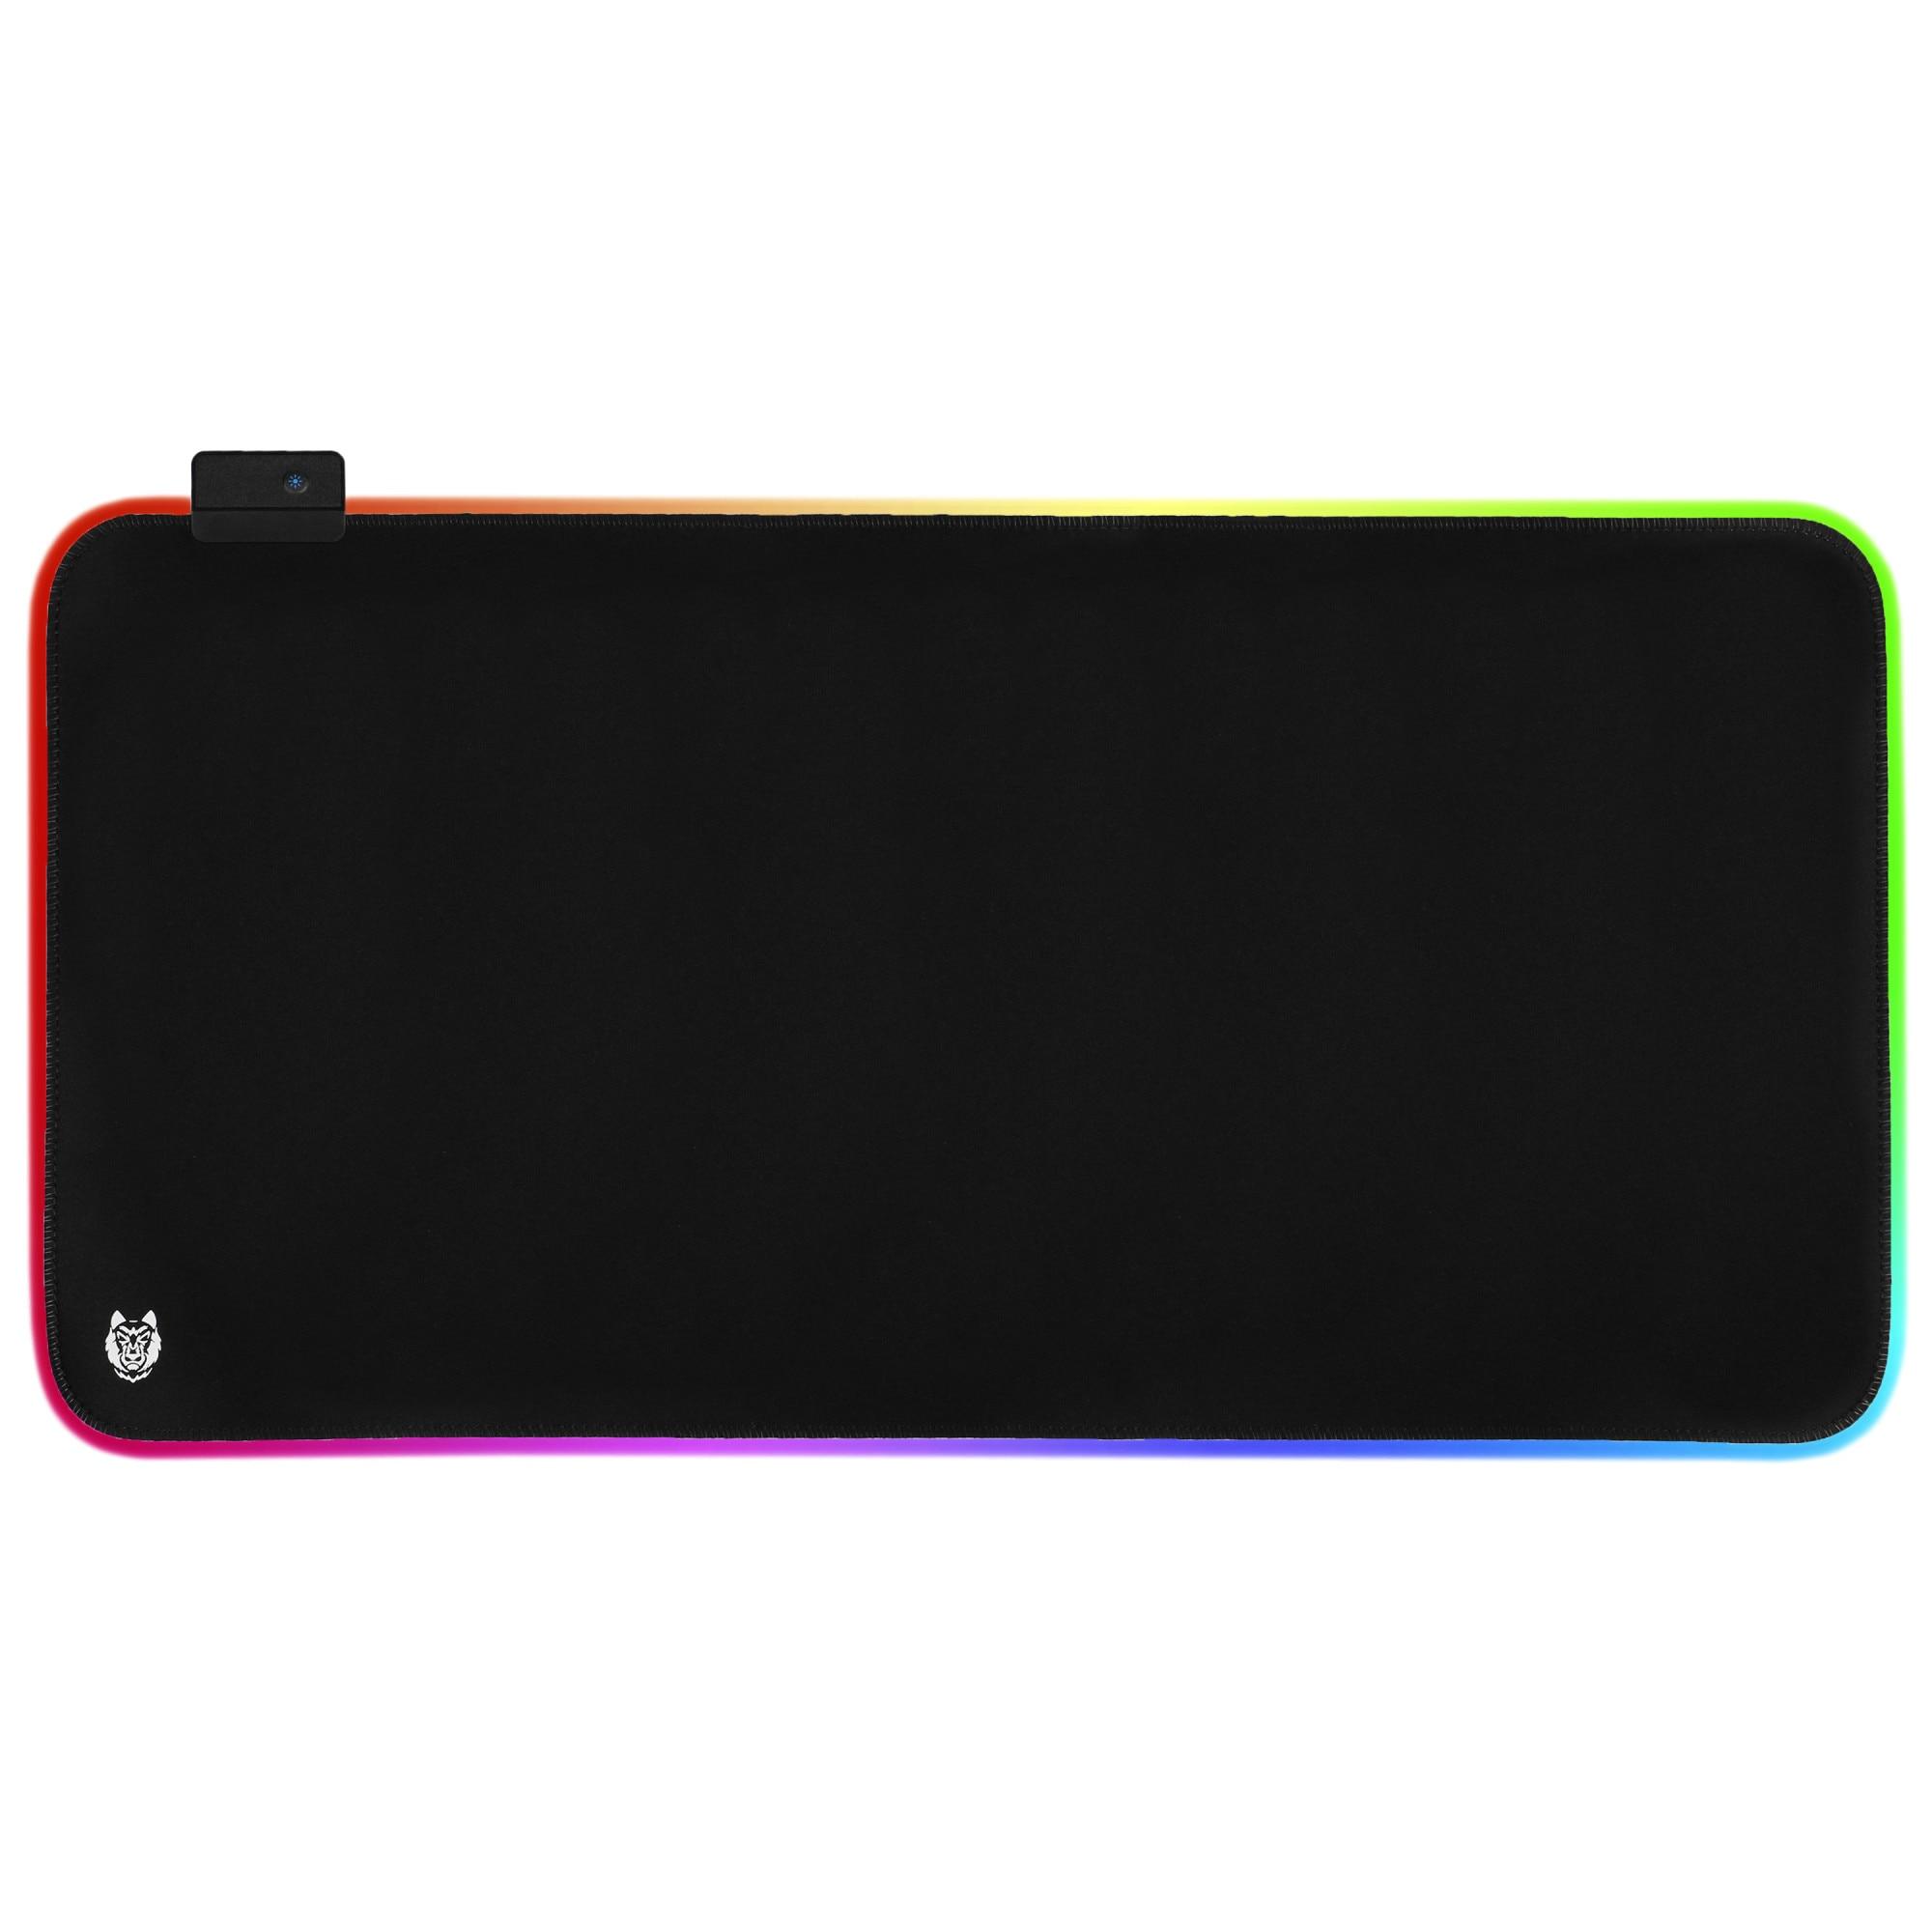 Fotografie Mousepad Gaming A+Nezha, iluminat , 800*300*4 mm